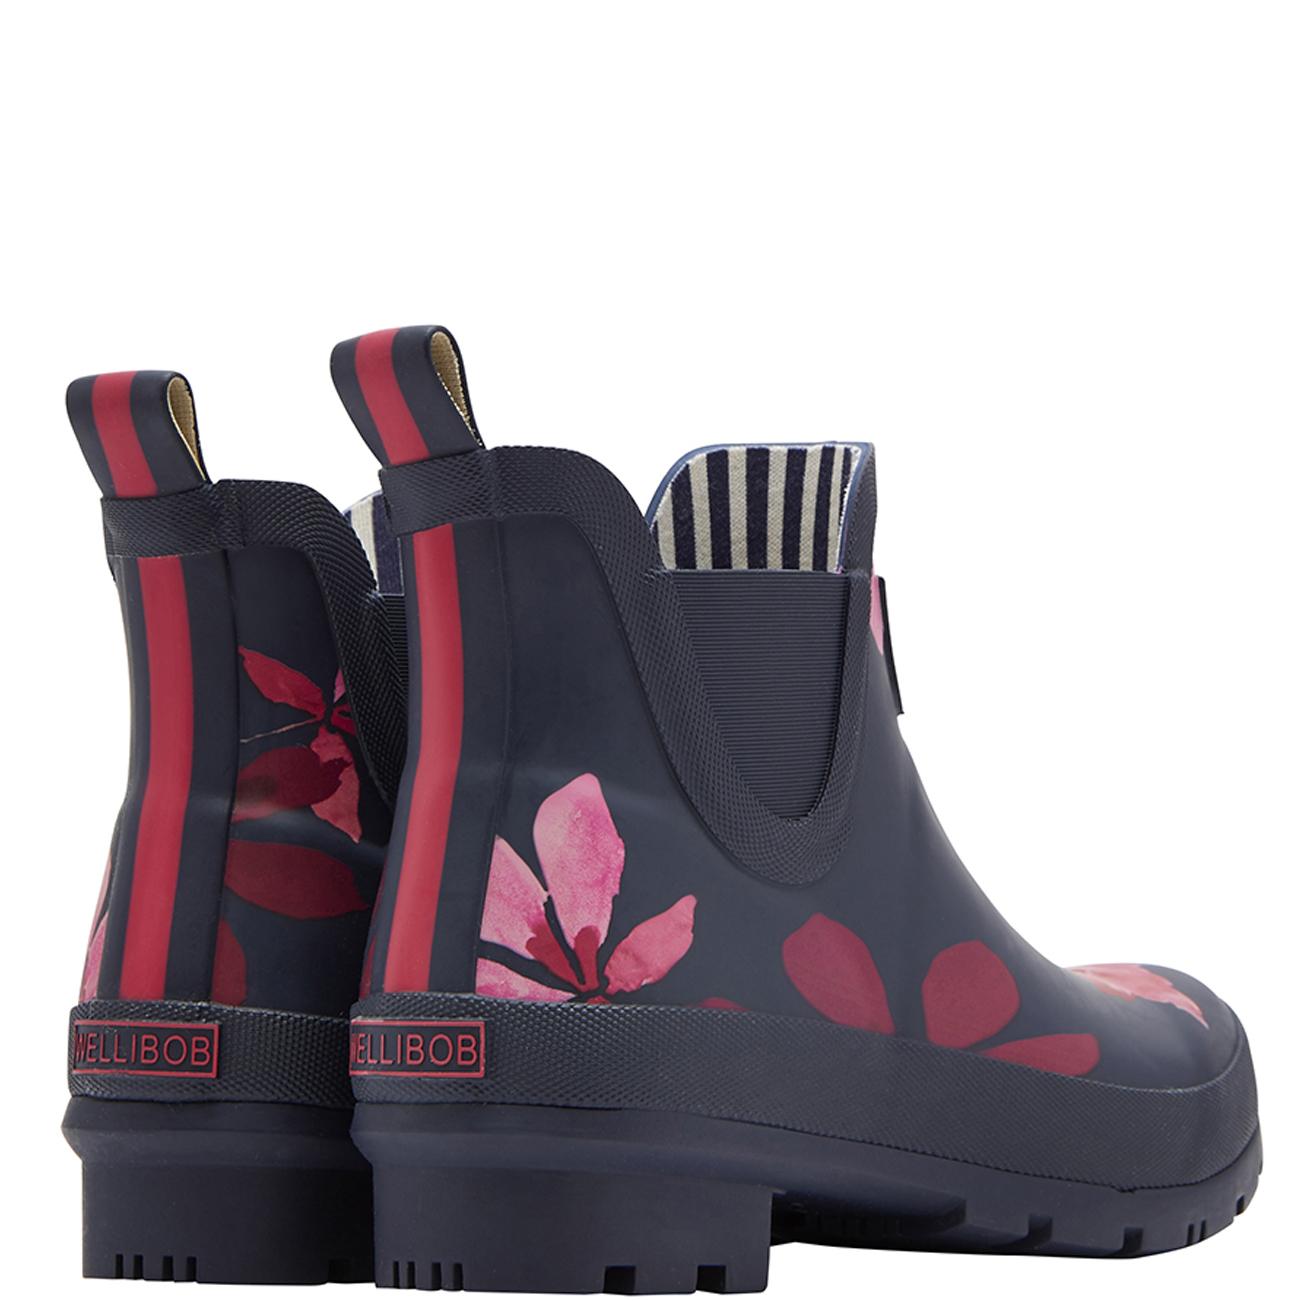 Para mujer Julios wellibobs Impermeable de Wellingtons Goma tobillo botas de lluvia Wellingtons de EE. UU. 5-10 9d67d7